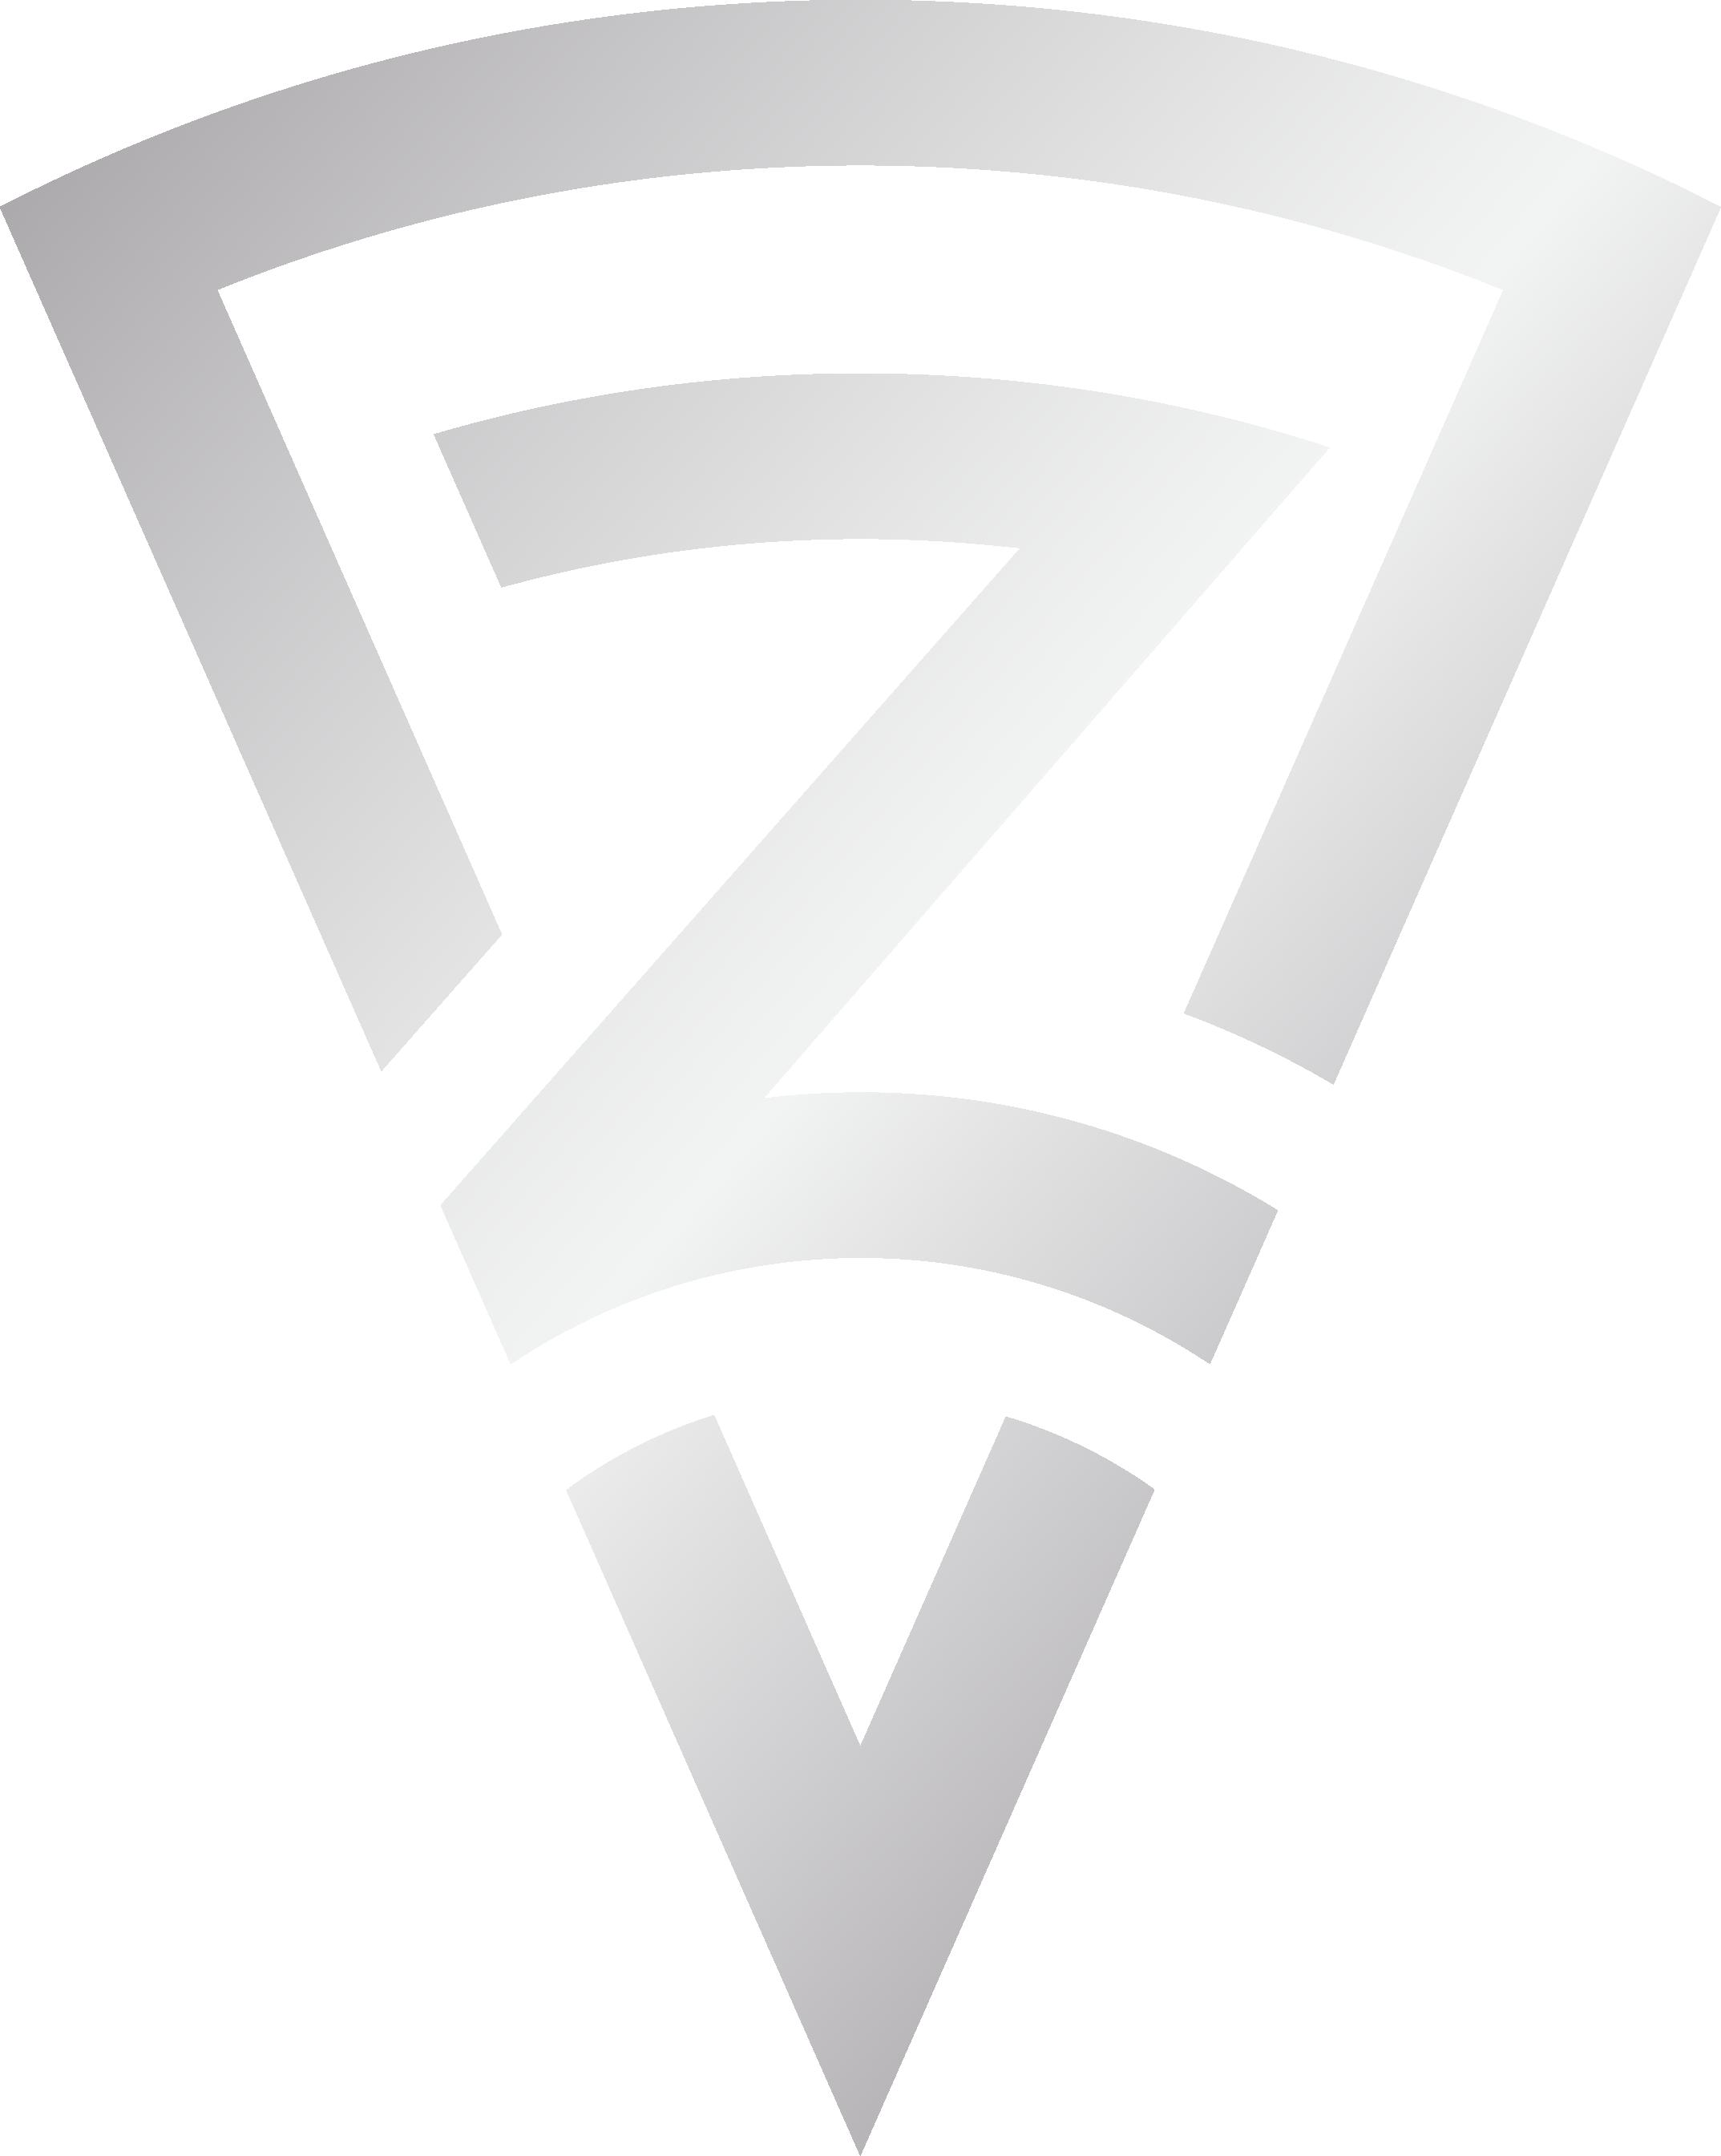 Zizza Authentic Pizzeria - A Fun Funky Italian Joint